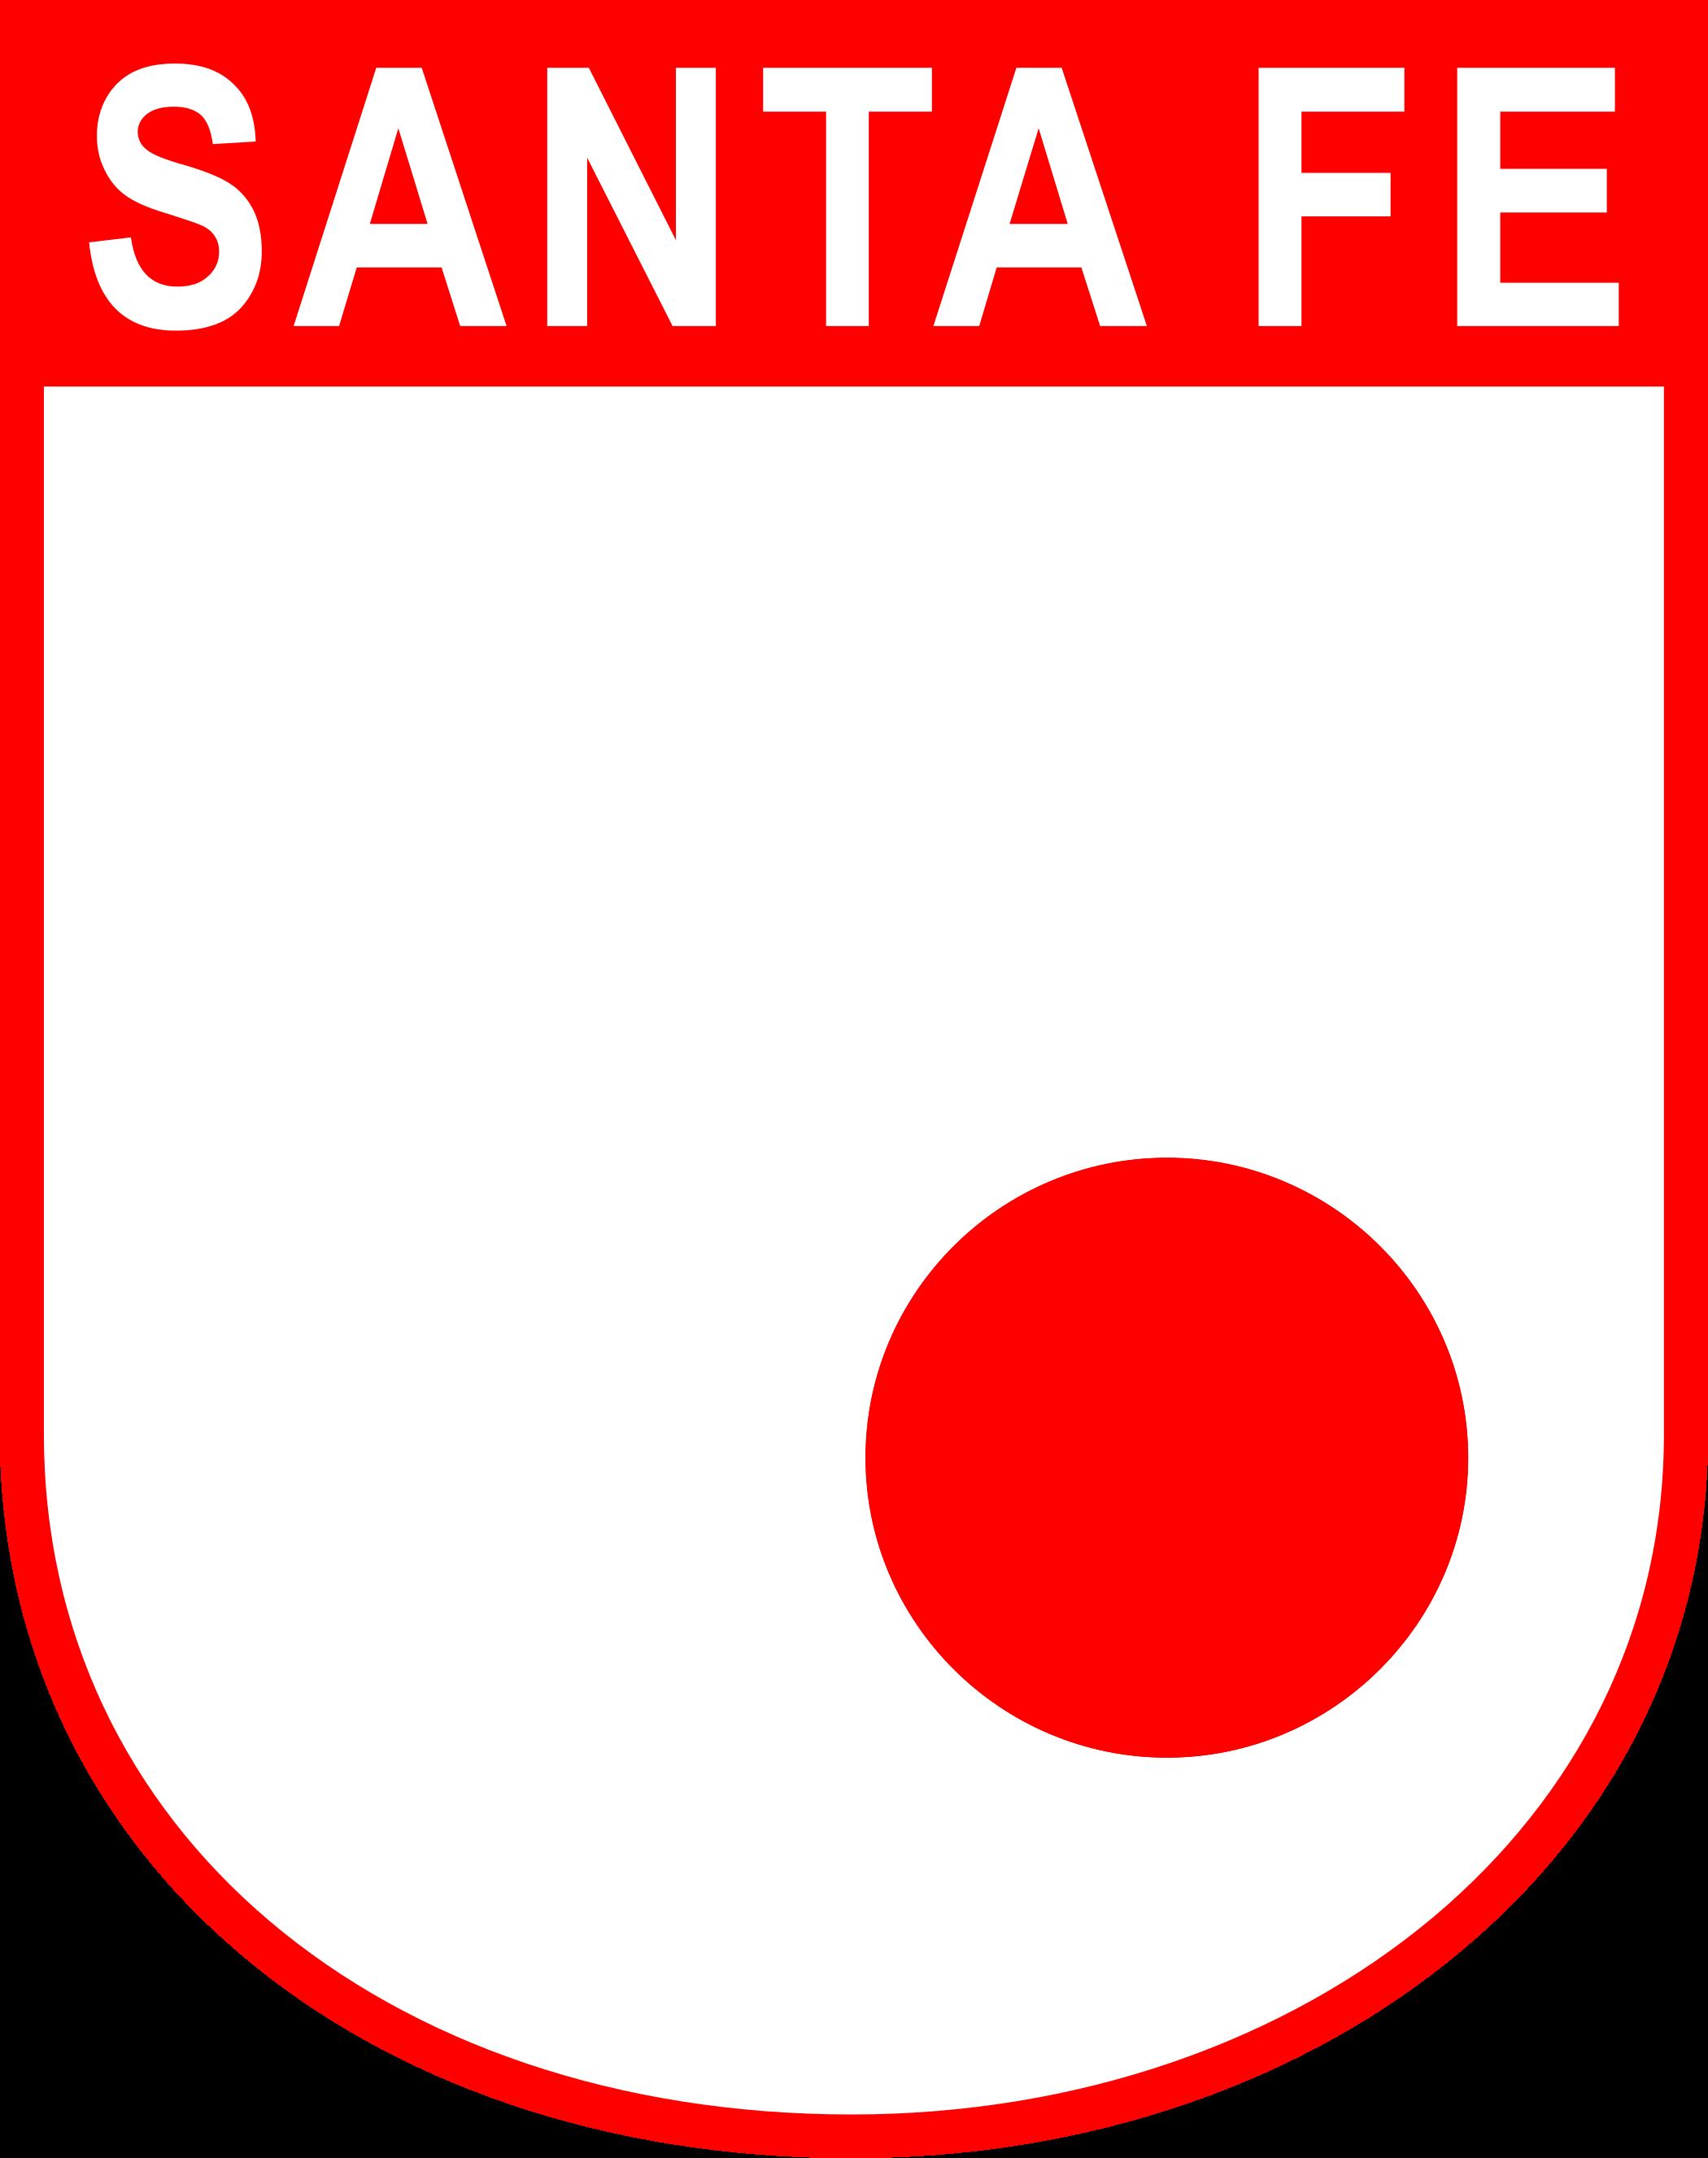 santa fe logo escudo 1 - Club Independiente Santa Fe Logo - Escudo